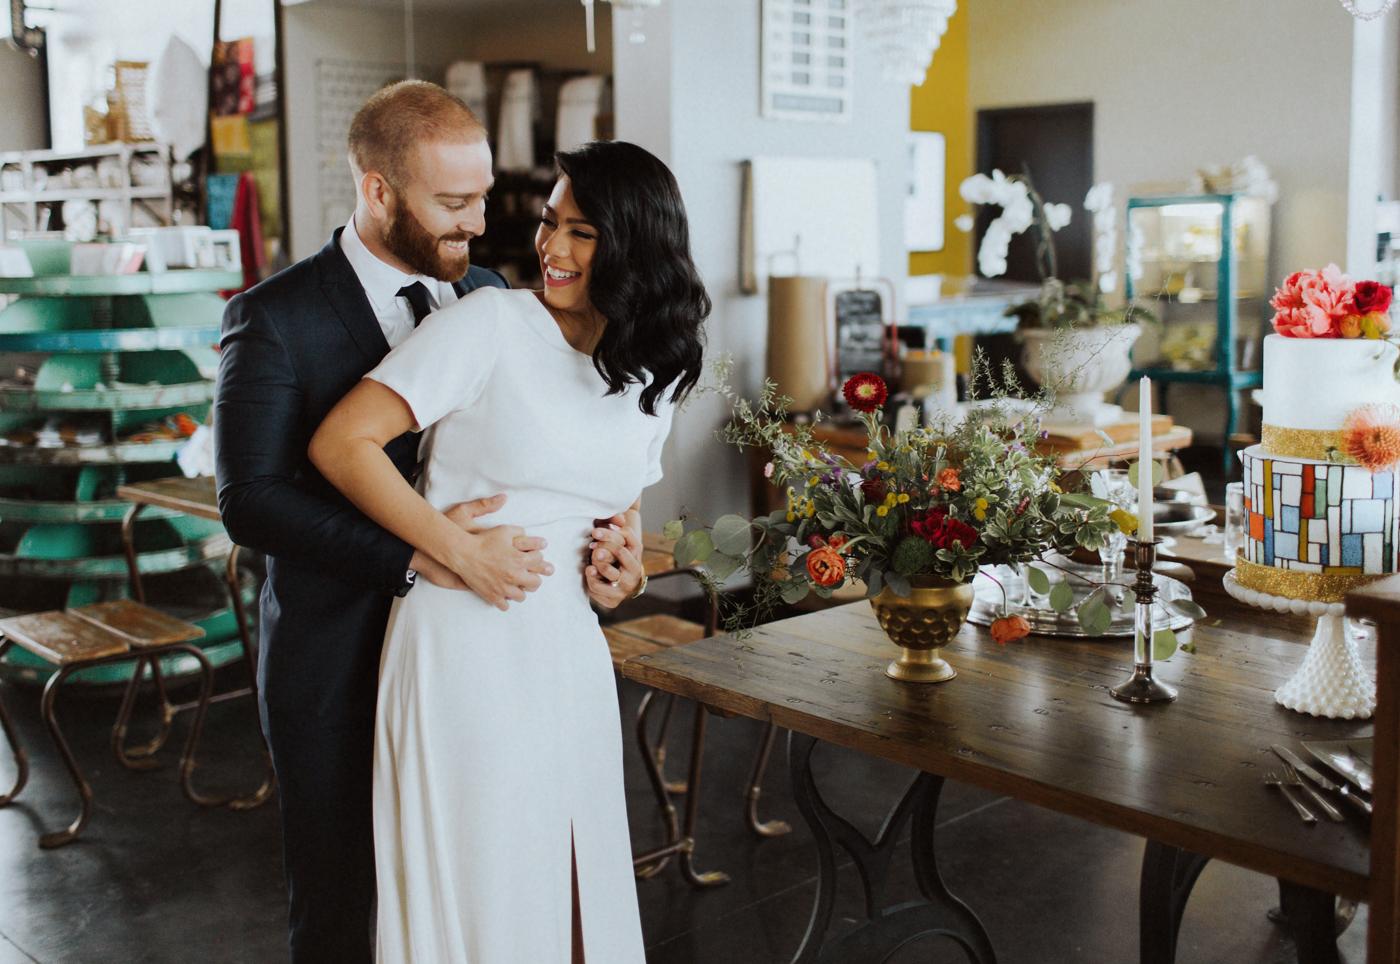 Wedding | Canvas Market | Lake Nona-Orlando, FL  | Vanessa Boy Photography | vanessaboy.com-75.com |Green Wedding Shoes.jpg